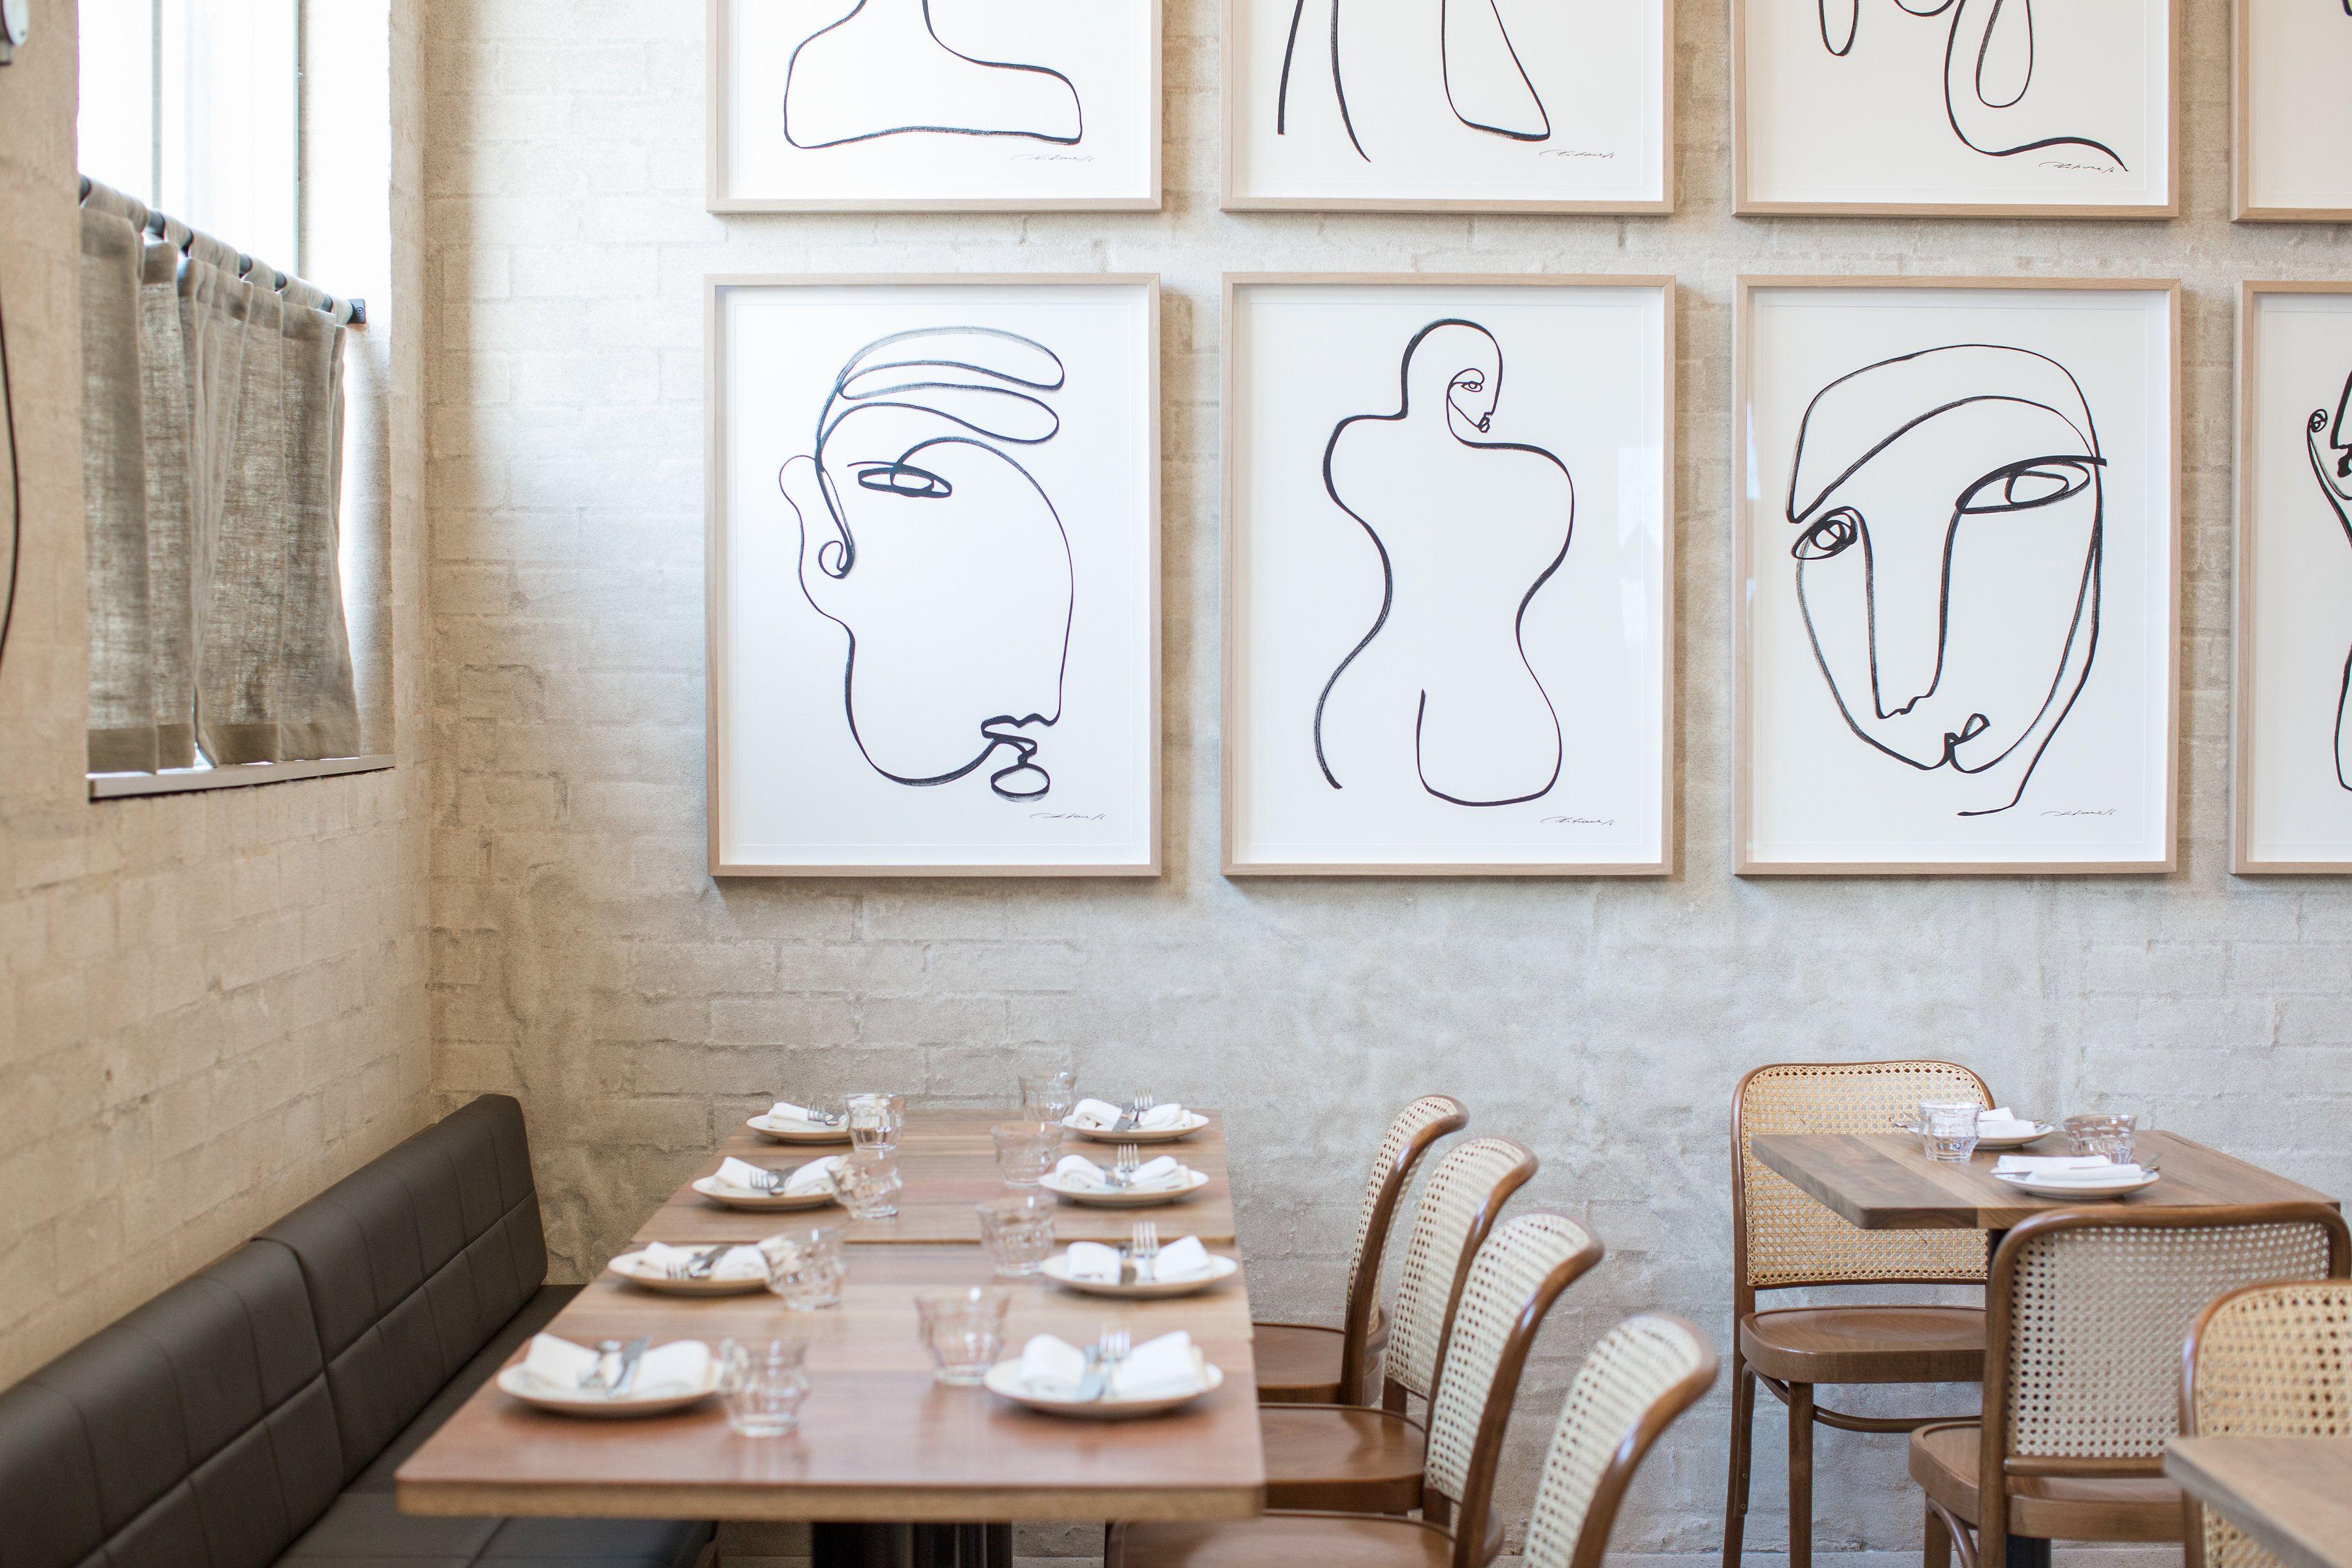 Sydney restaurant Paddington Inn with the work of Christiane